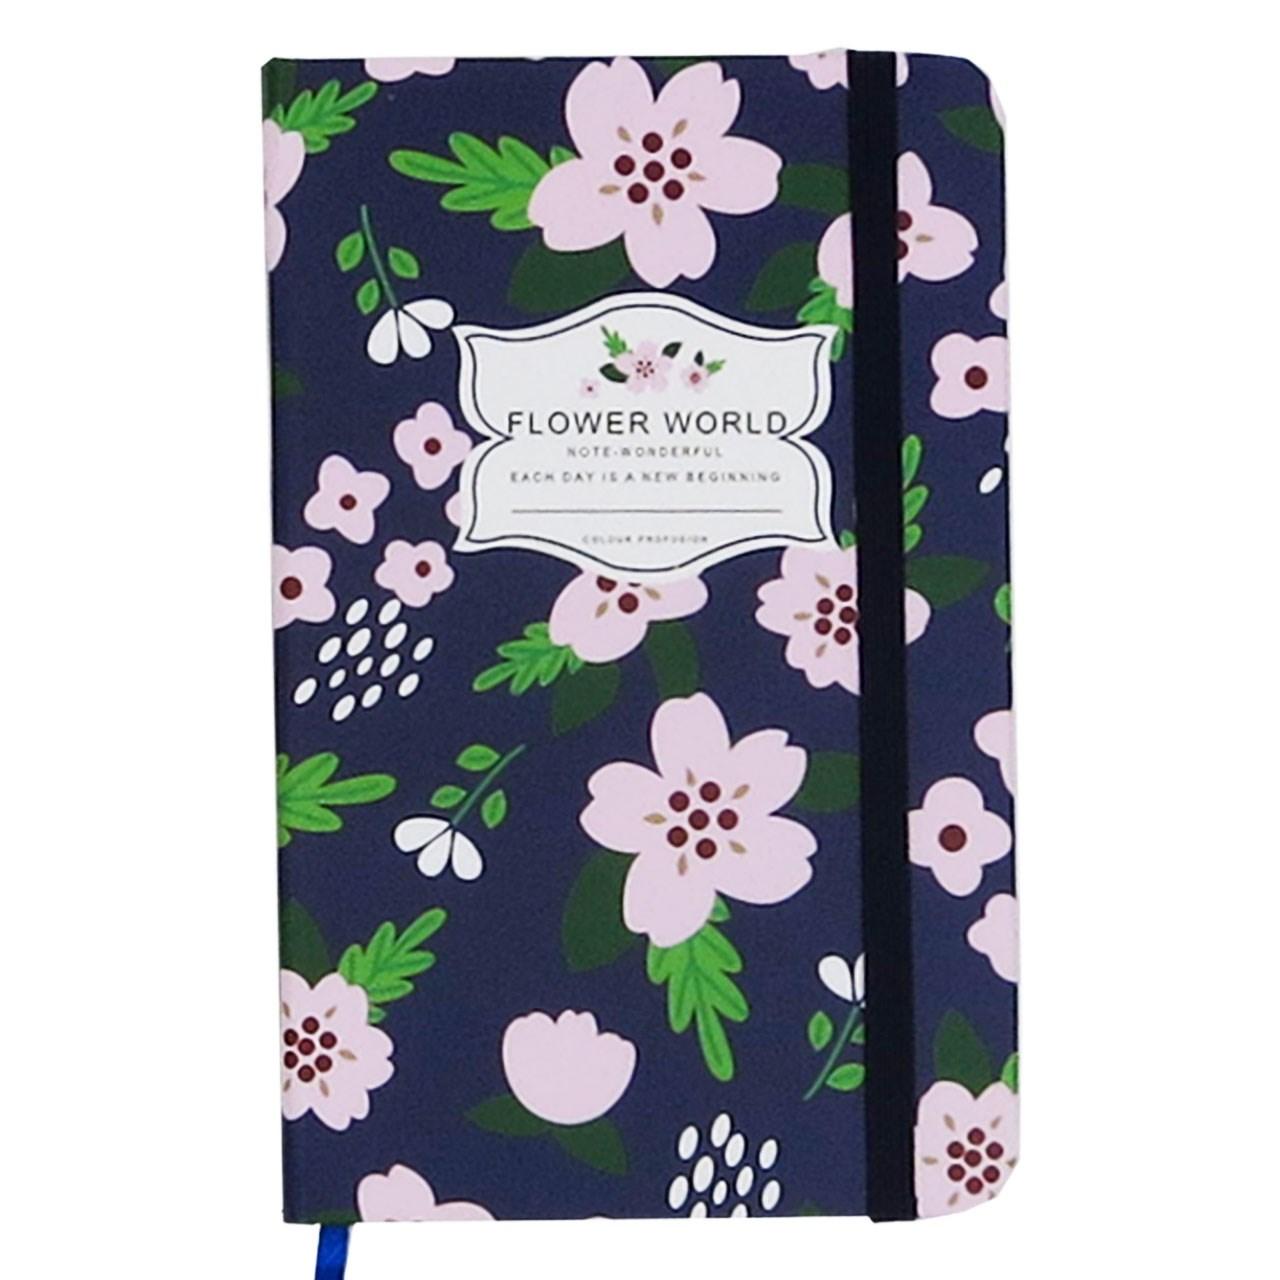 دفتر یادداشت کوچک فانزی مدل Flowery World